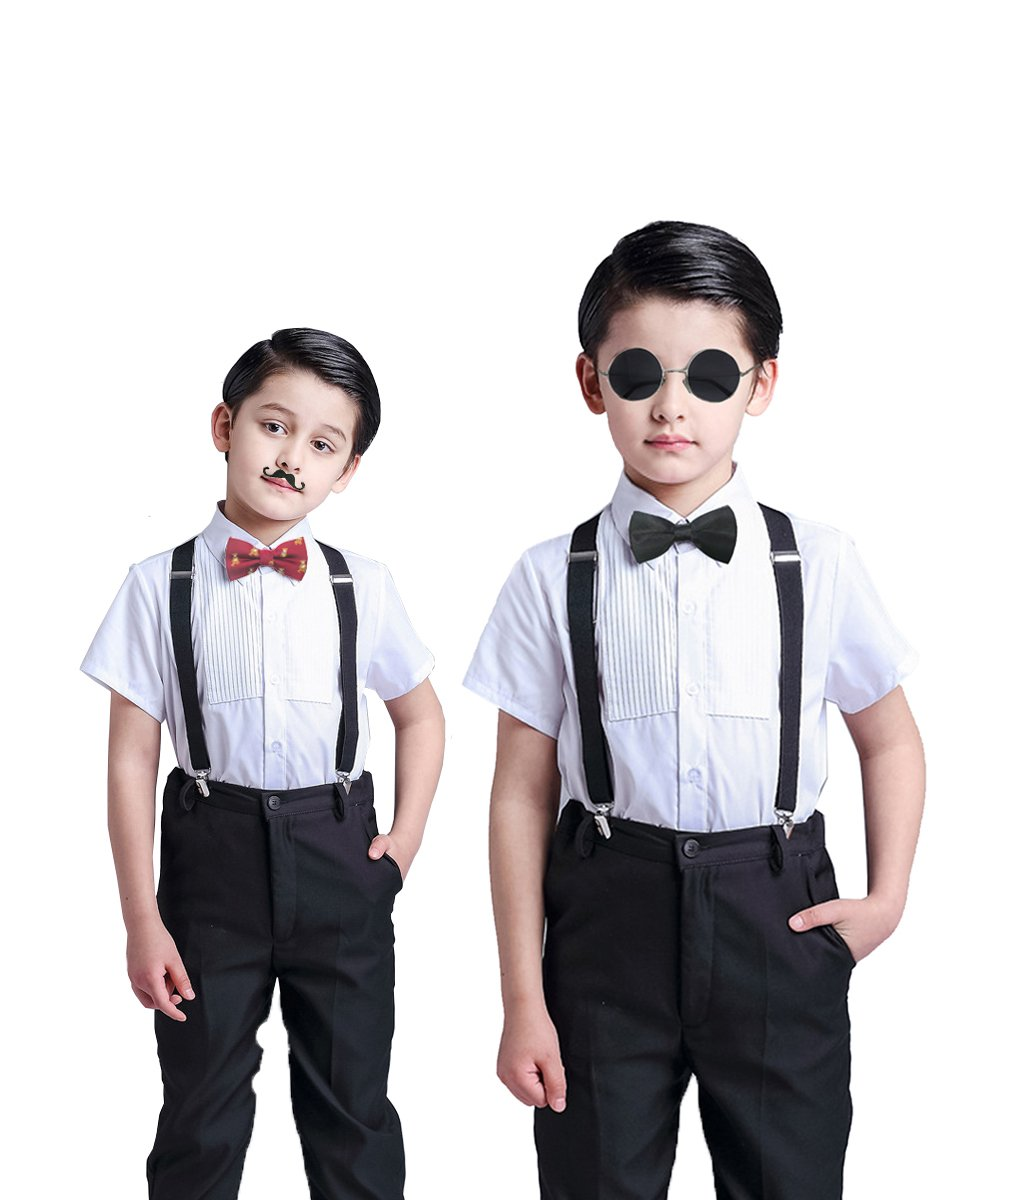 Boys Kids Suspenders, Pre-Tied Bow Tie & Skinny Tie, Fake Beard Accessory Set